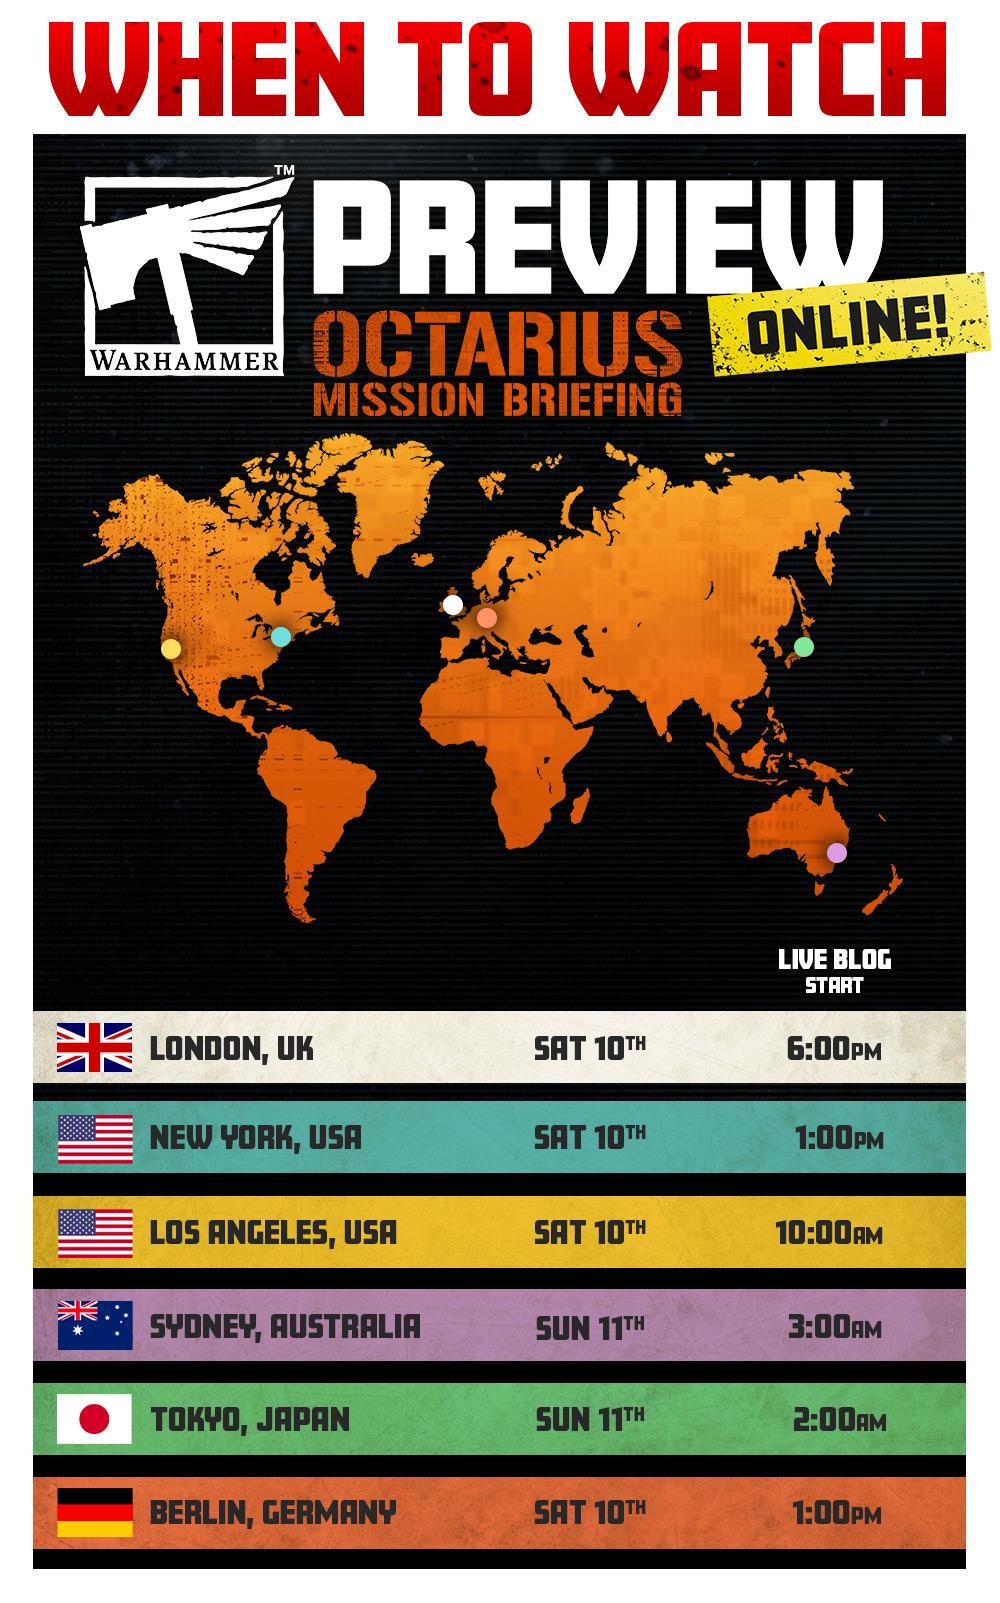 OctariusPreview Incoming Jul04 Map3ku